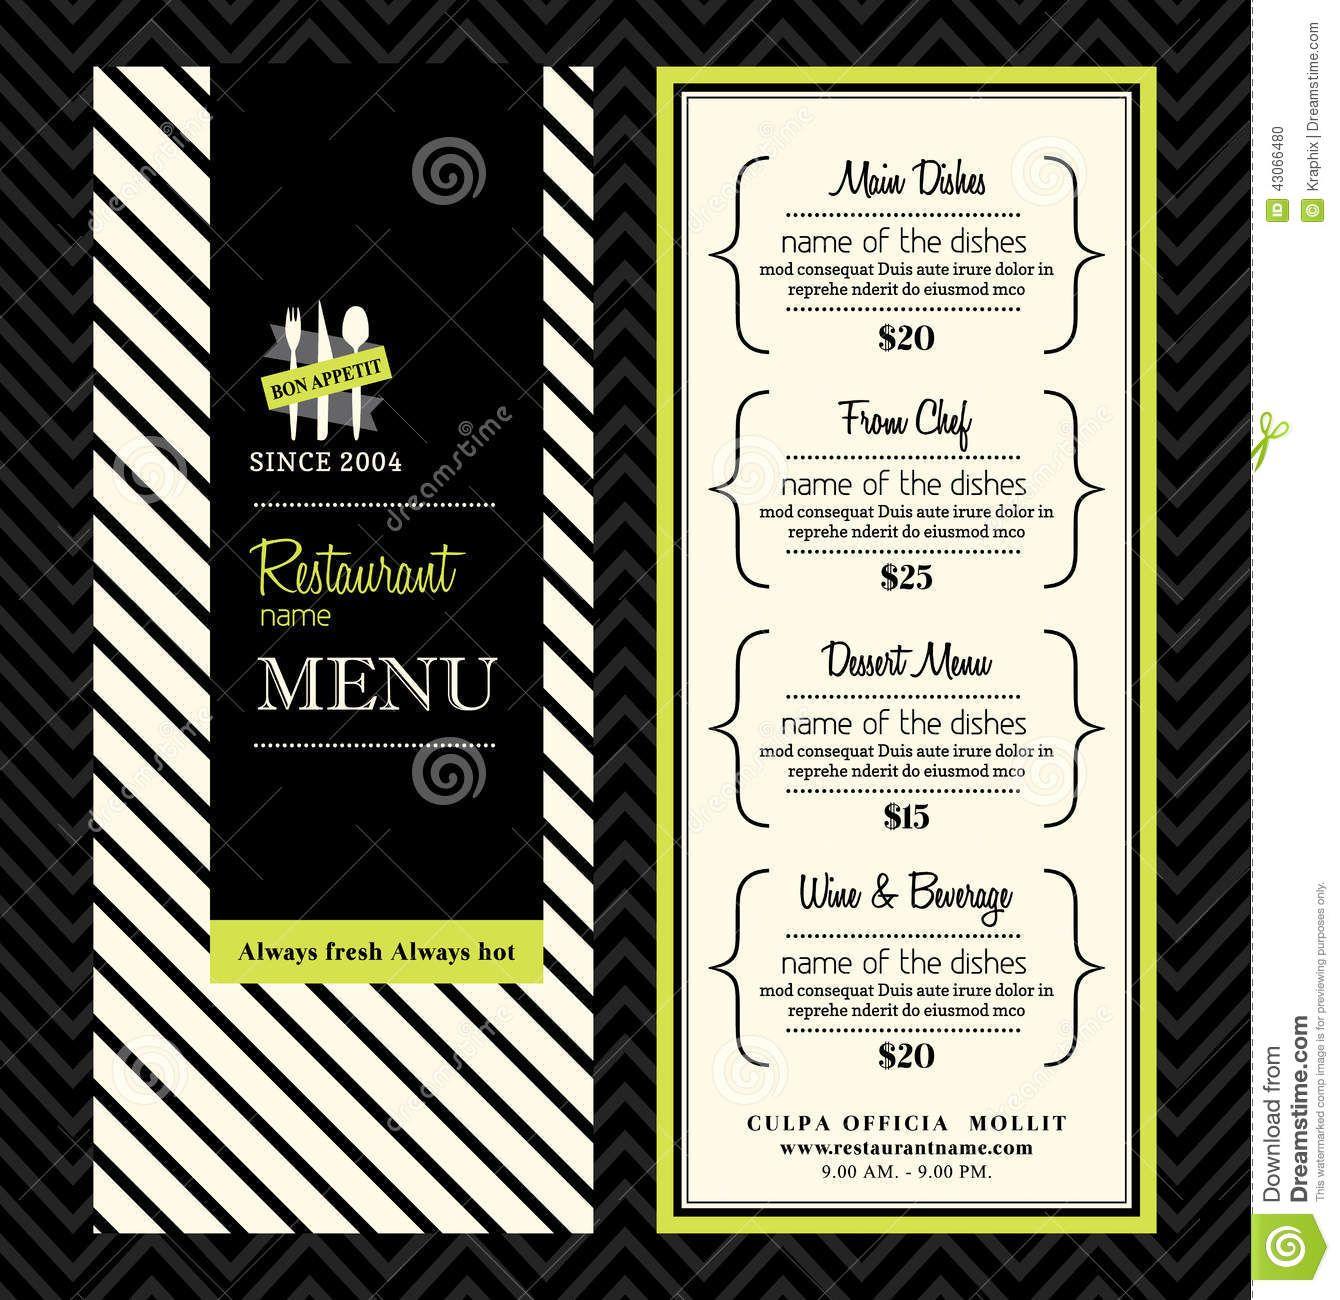 Modern Restaurant Menu Design Template Layout Stock Vector  Image